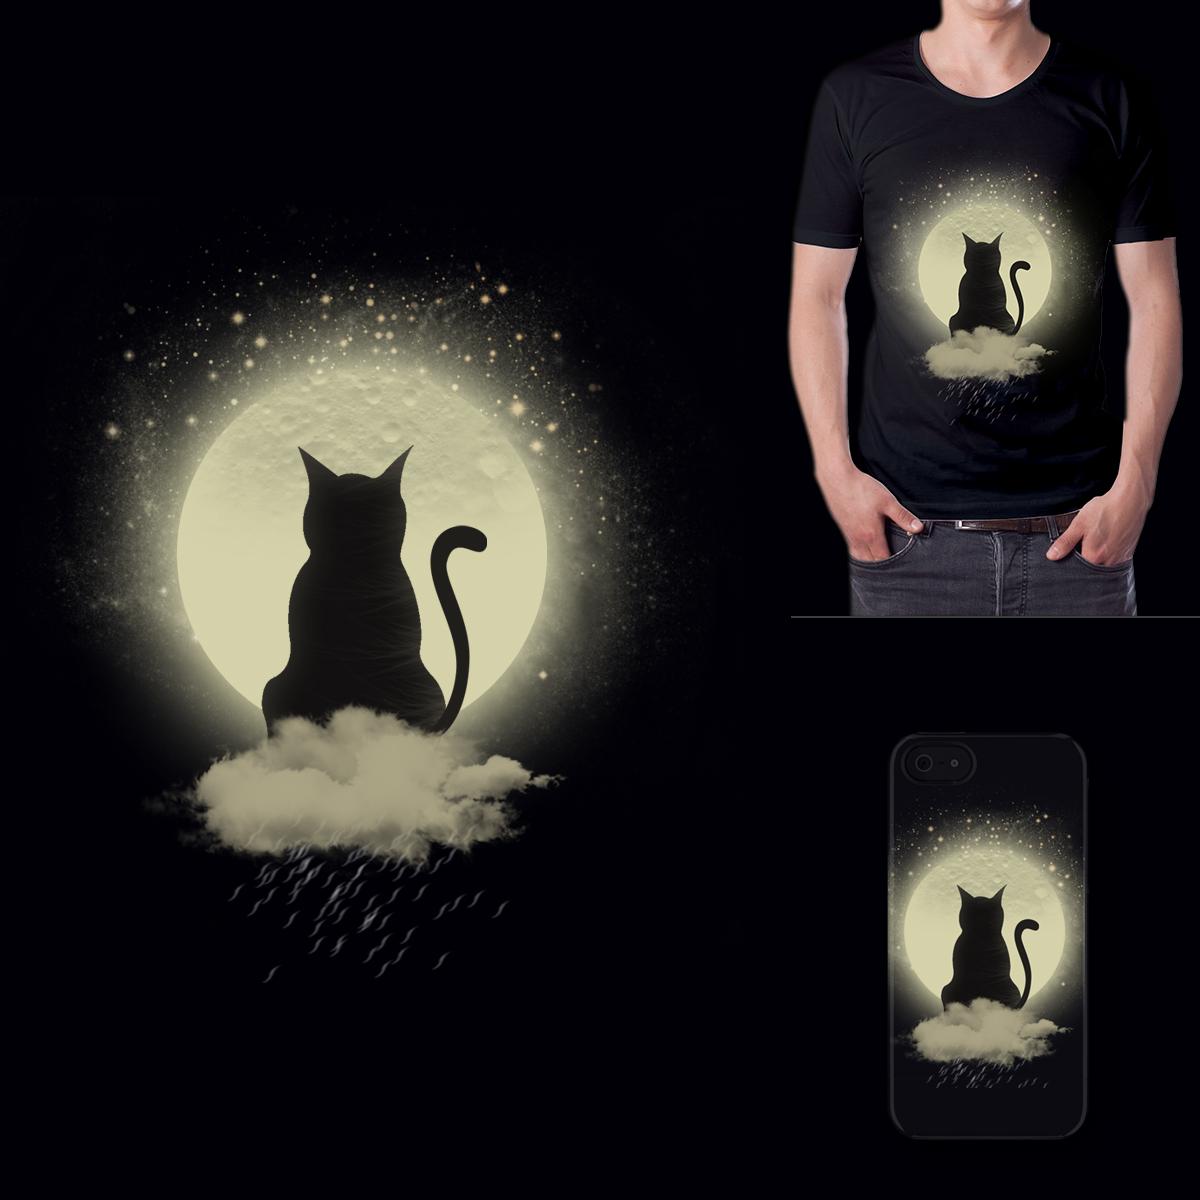 Cozy Cat by kaya205 on Threadless